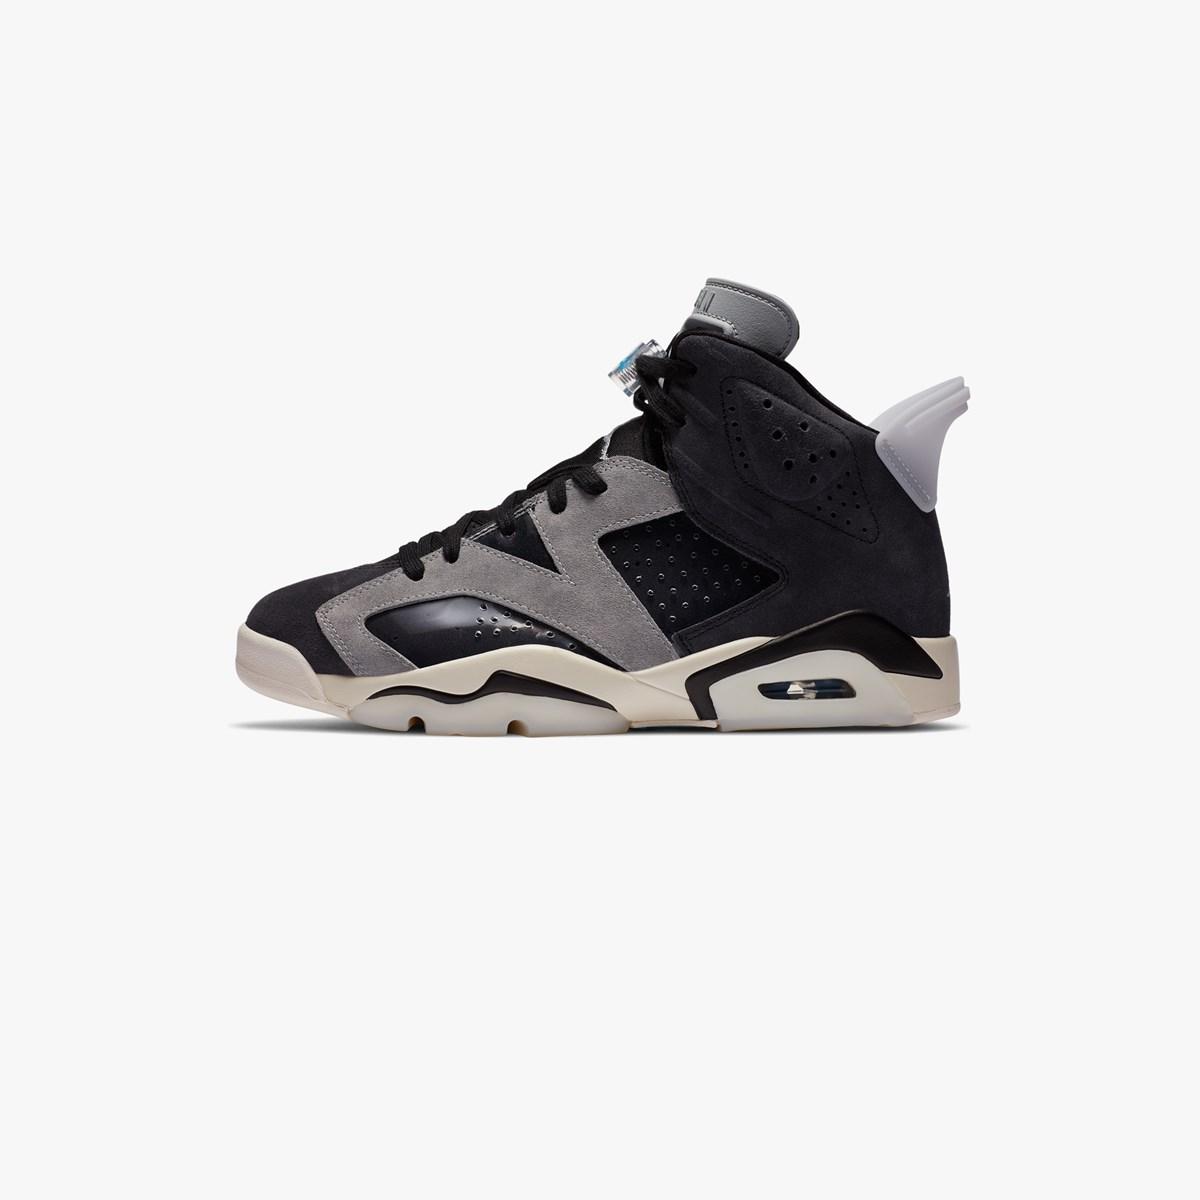 Jordan Brand Wmns Air Jordan 6 Retro - Ck6635-001 - SNS | sneakers & streetwear en ligne depuis 1999